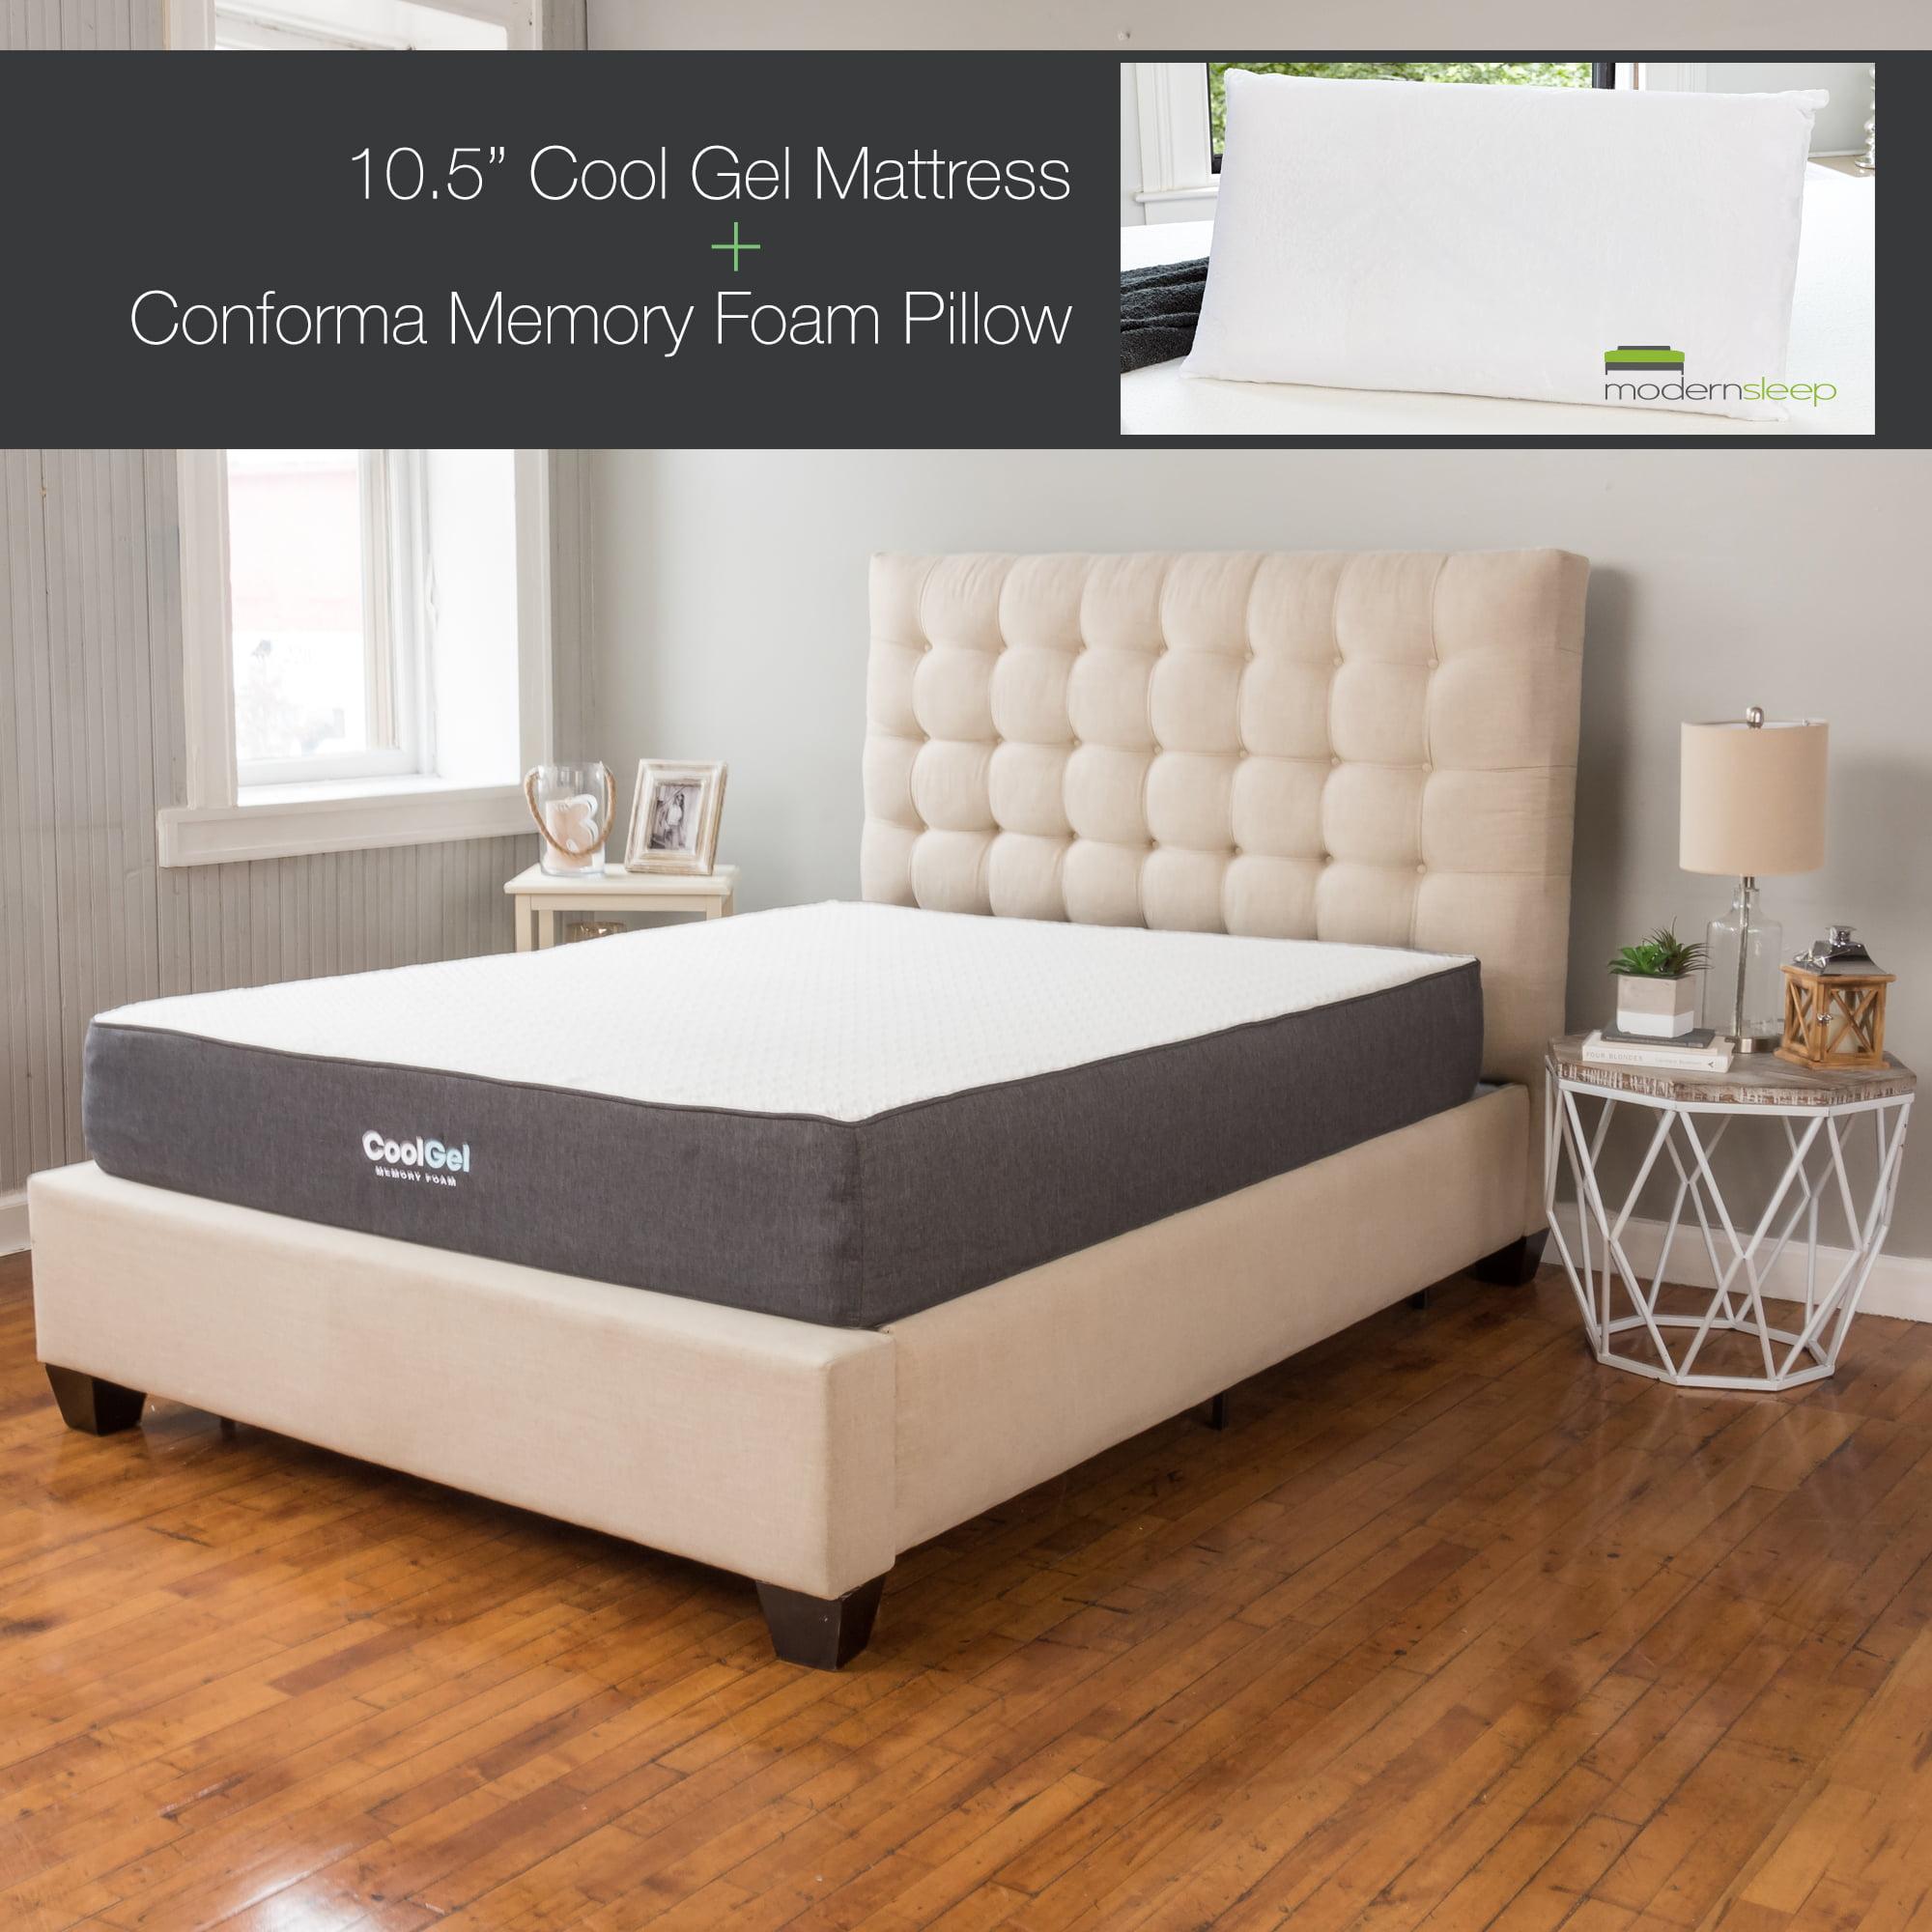 Modern Sleep Foam 10.5-Inch Cool Gel Ventilated Gel Memory Mattress by Classic Brands